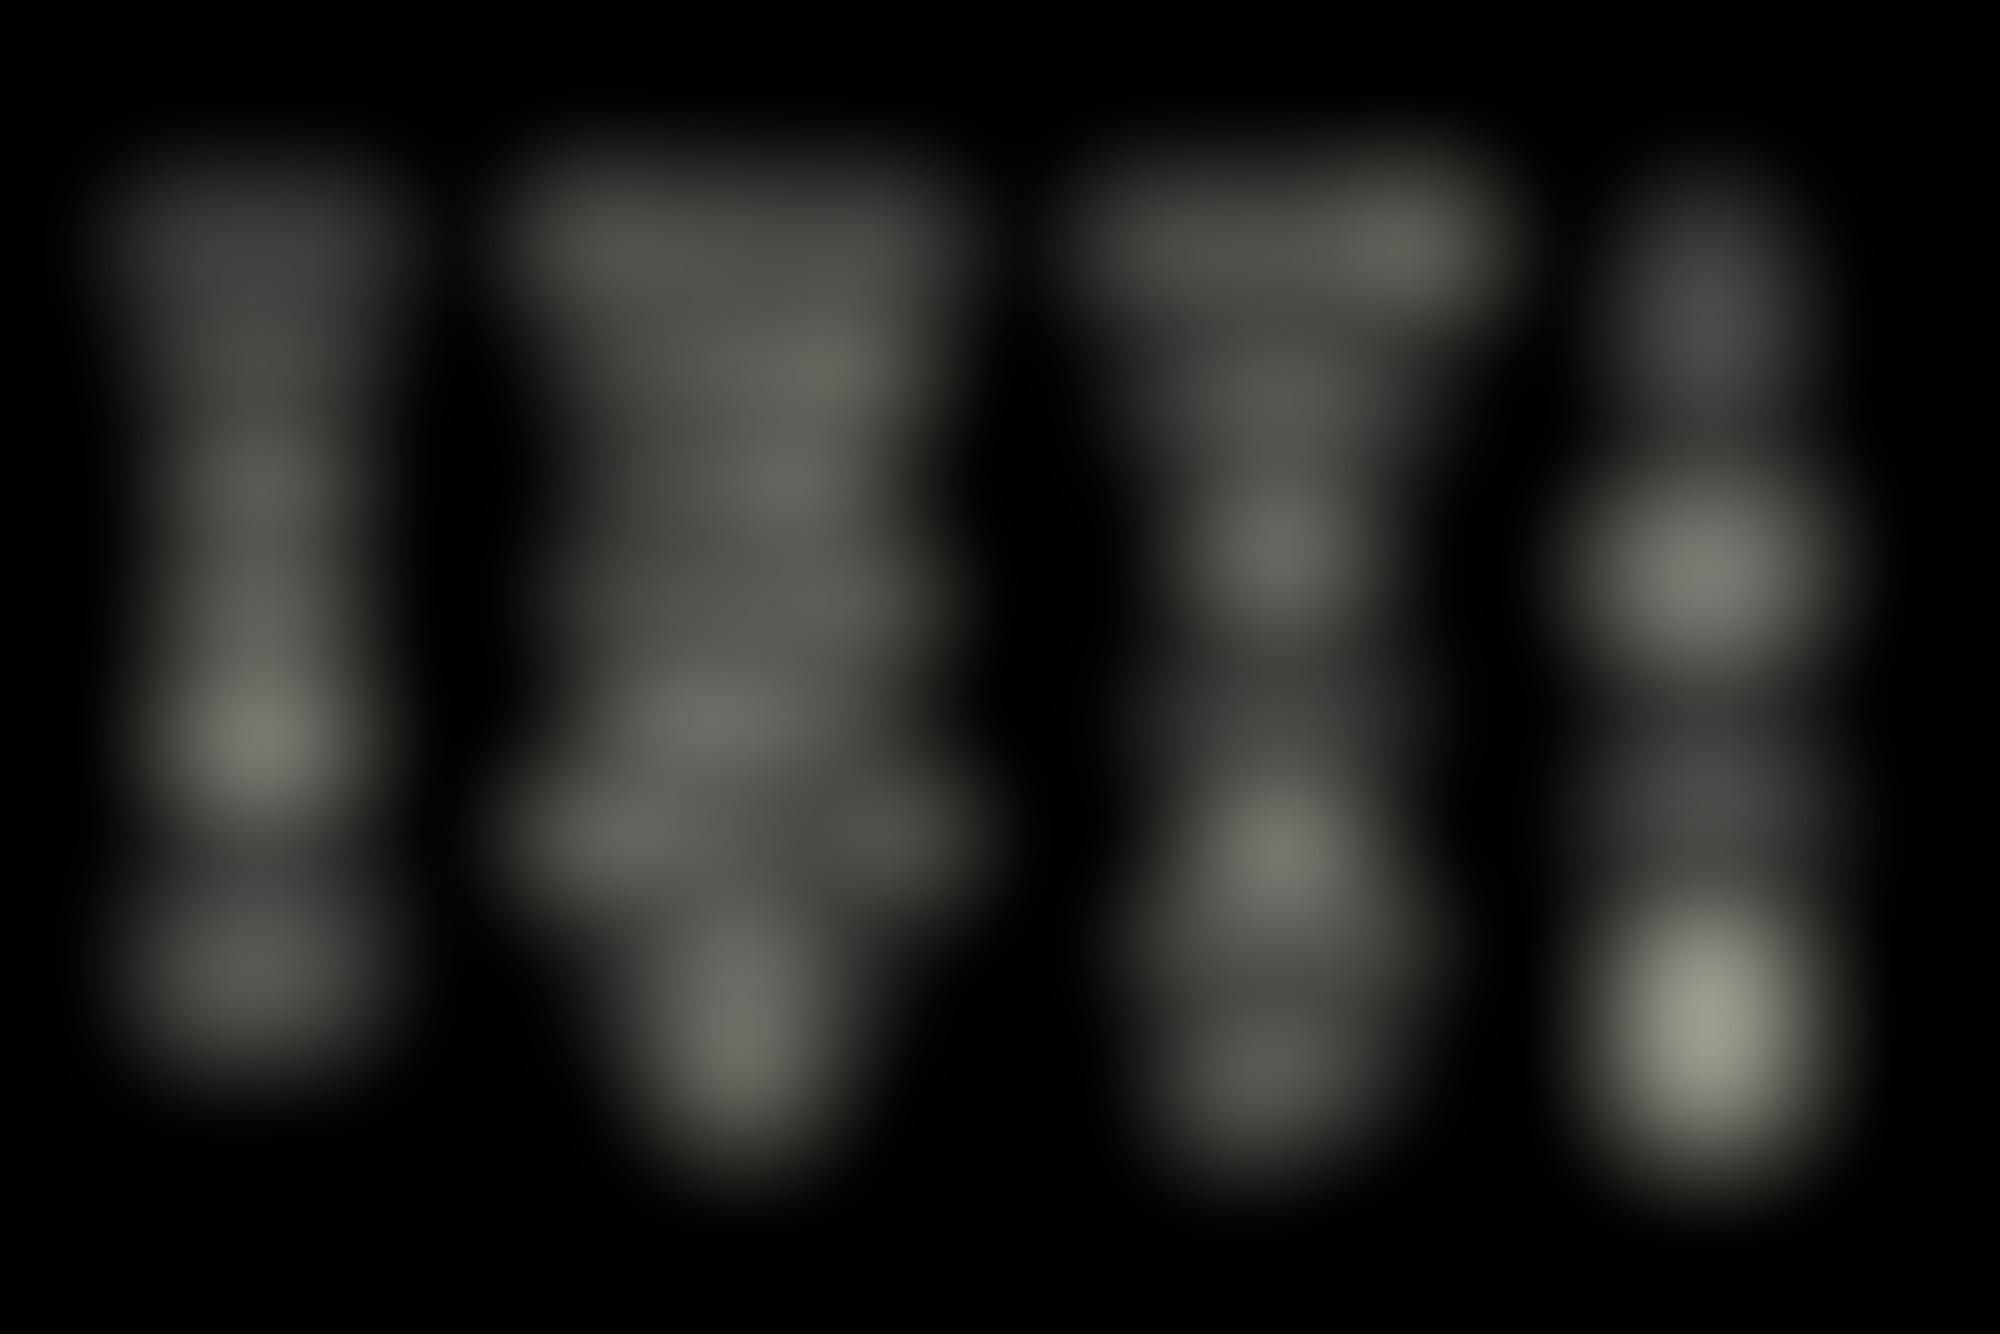 Gits reedit logos autocompressfitresizeixlibphp 1 1 0max h2000max w3 D2000q80sdcb55b0bc669dc21dbe2aa9e8ca98b17